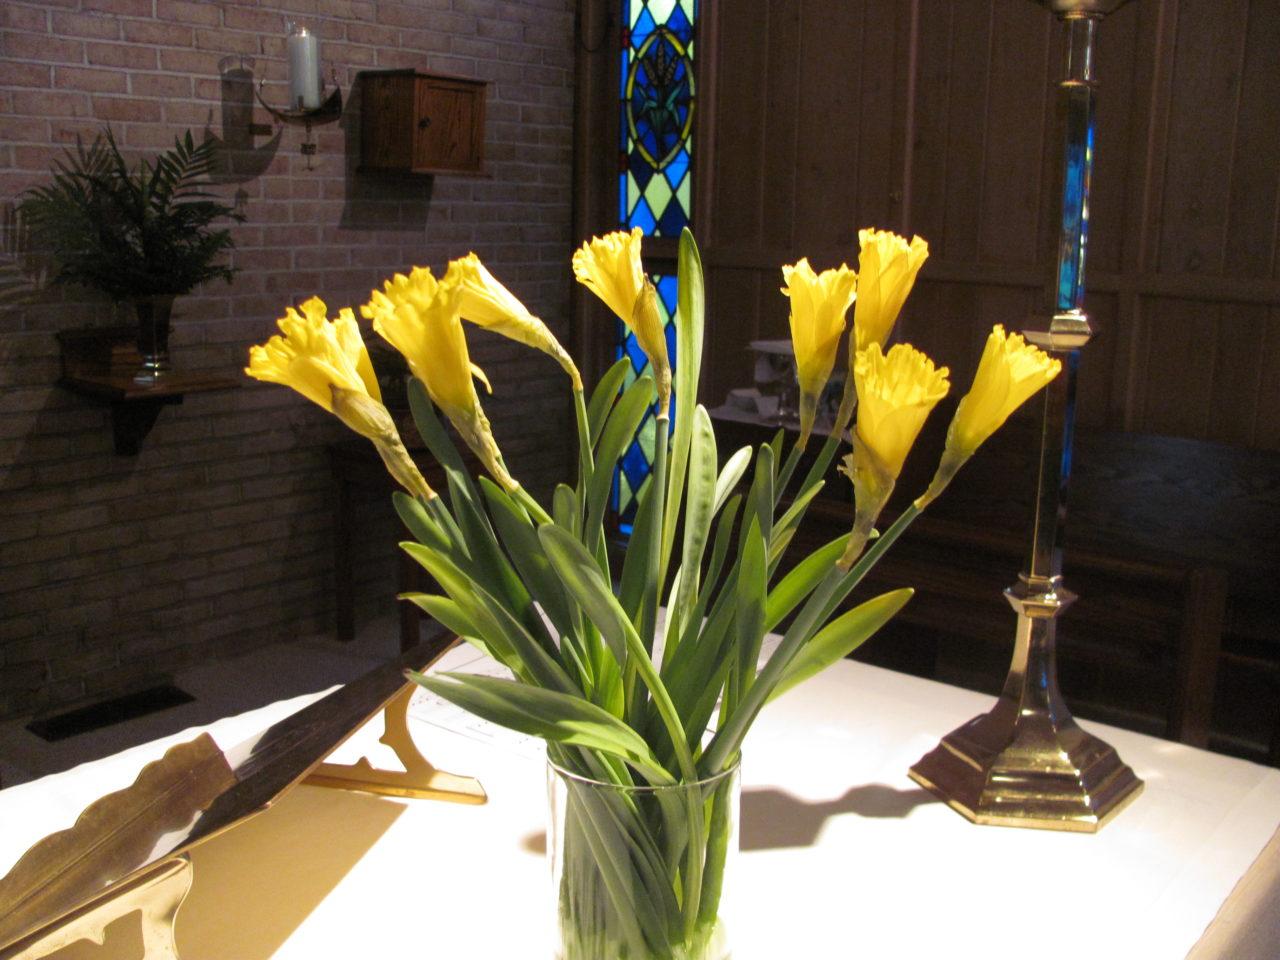 St. David's Day celebrated